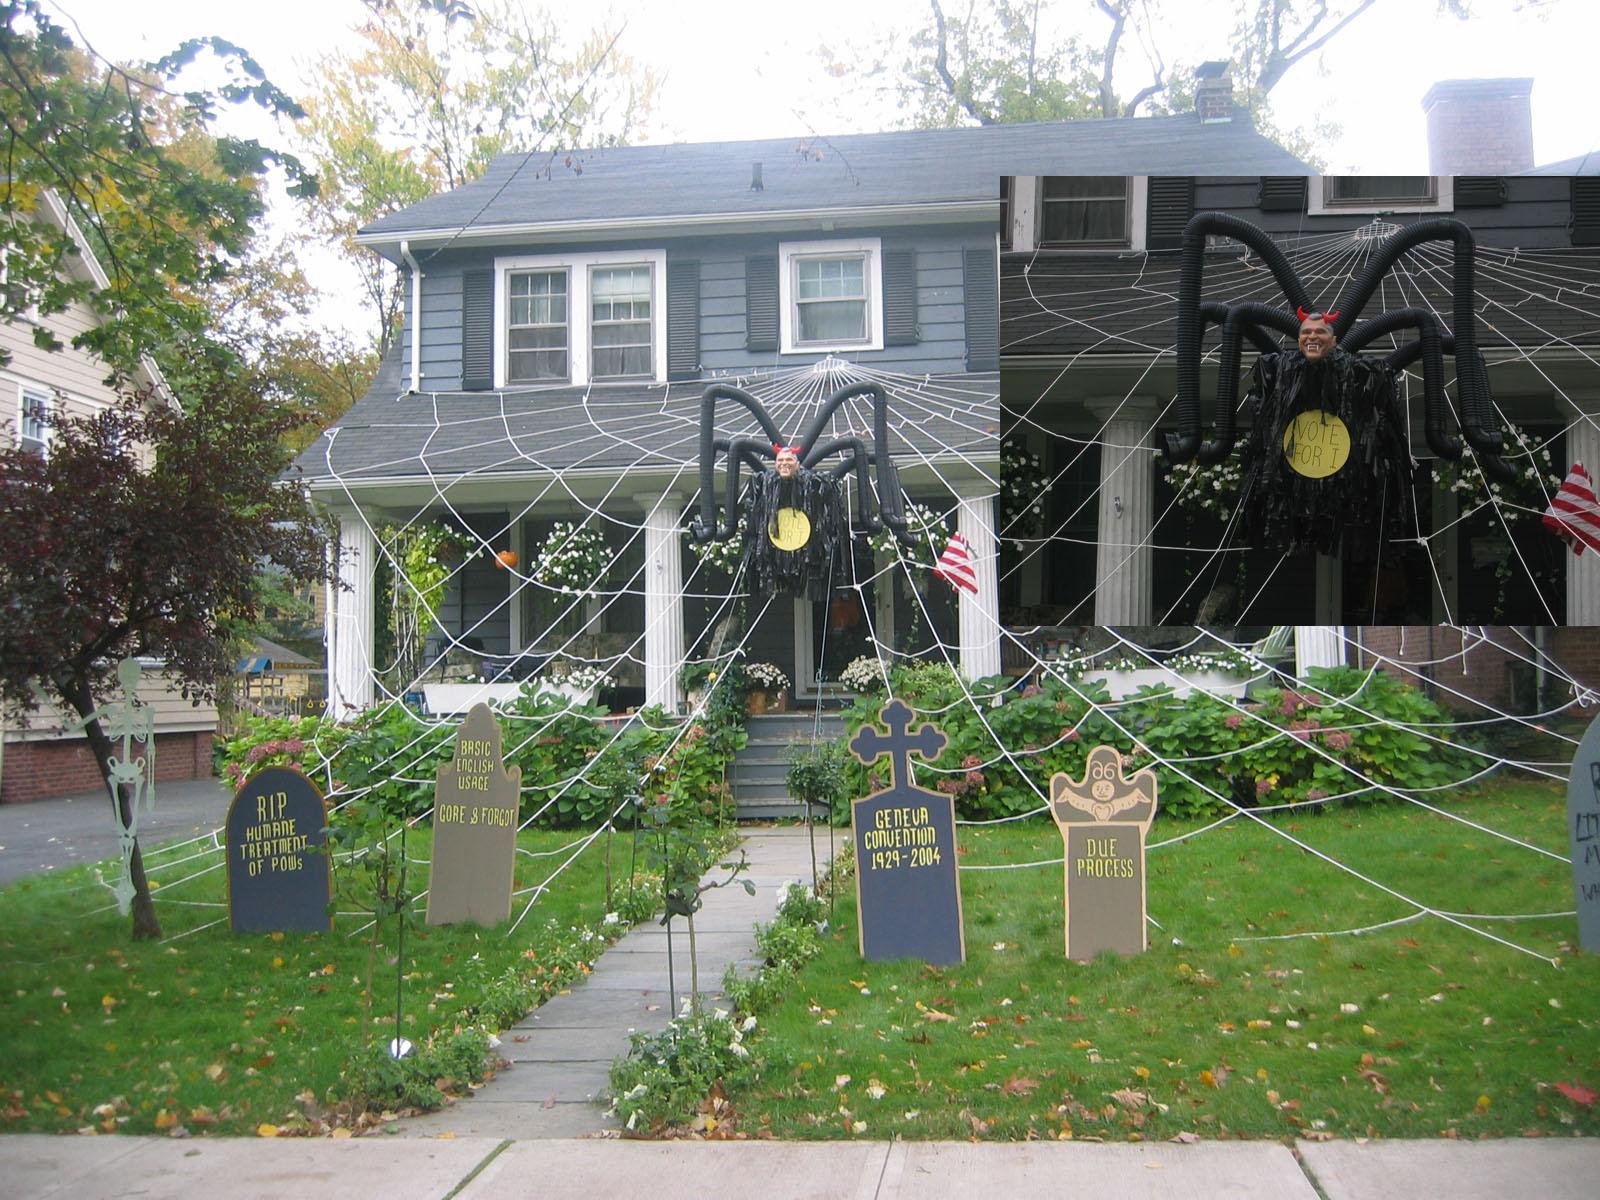 Casas decoradas para Halloween – Descargar imágenes gratis